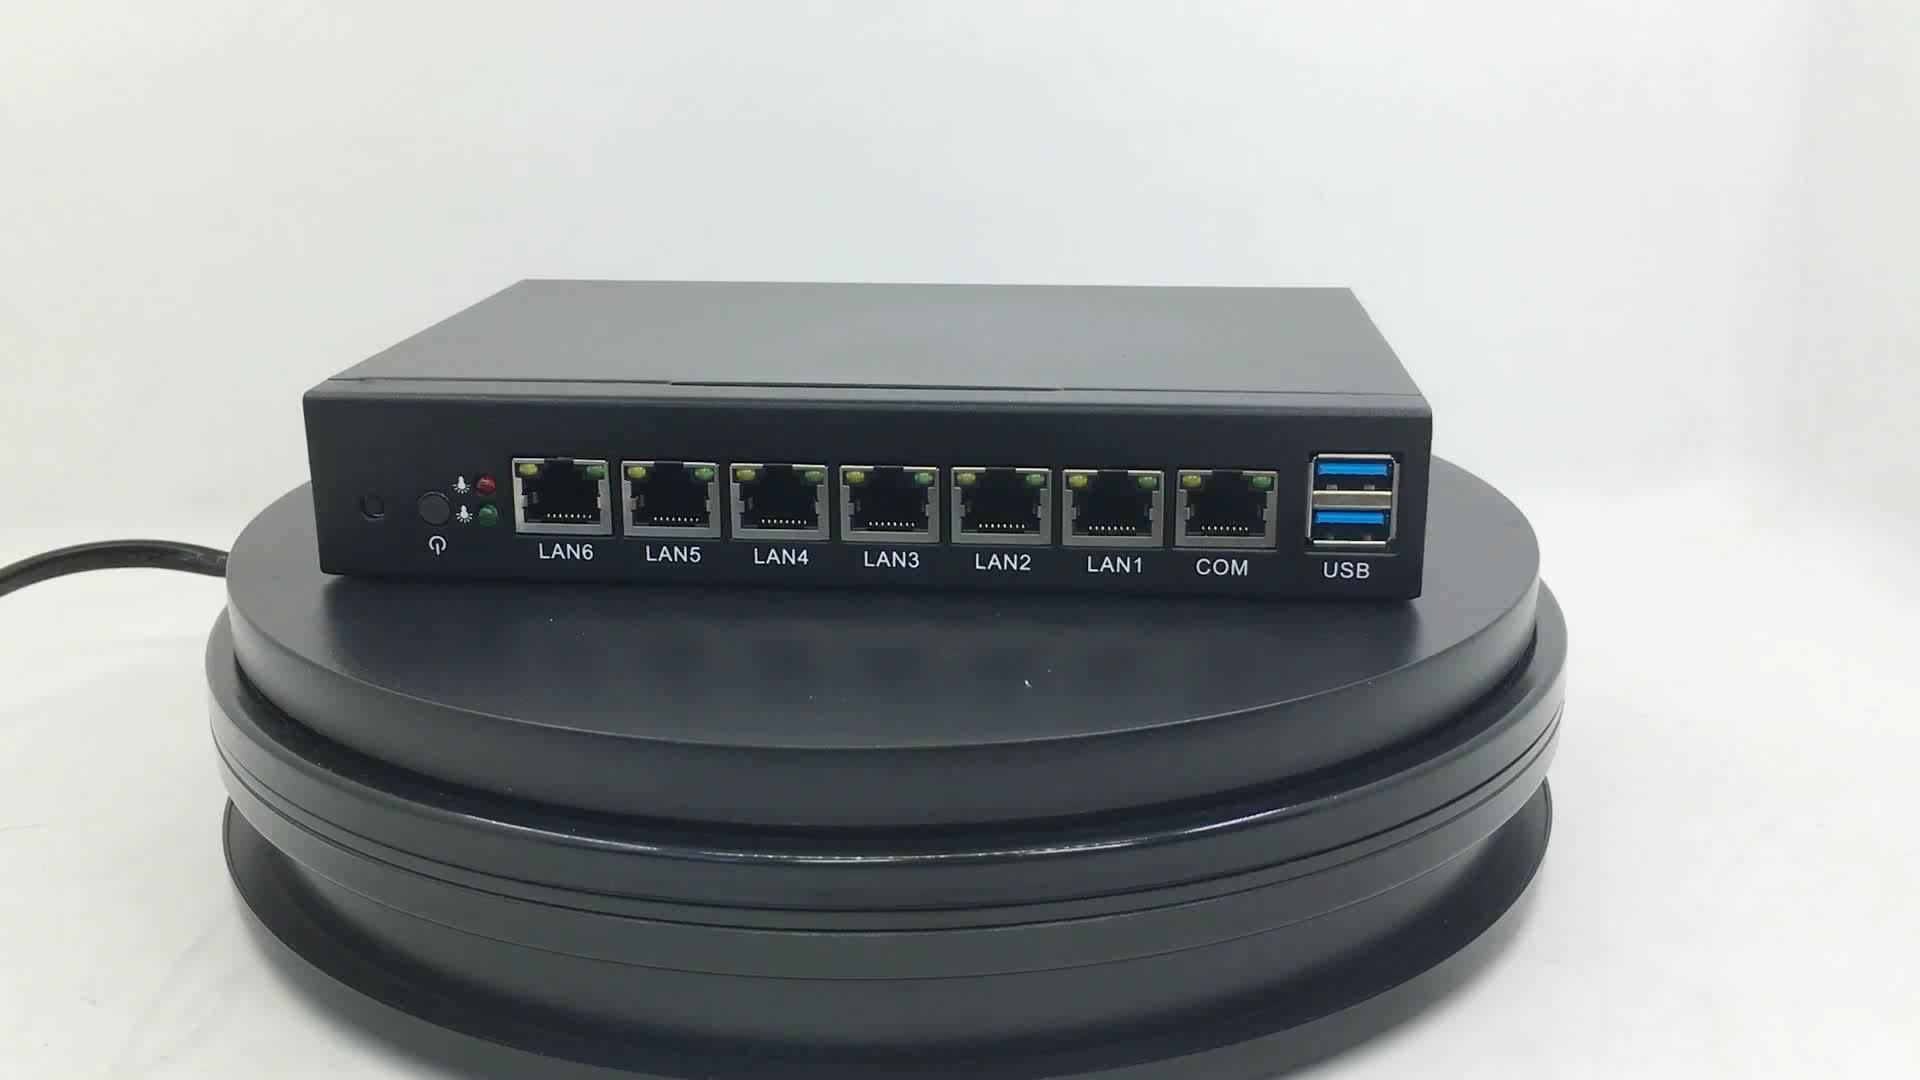 XCY Celeron 1037U 6 lan mini use Pfsense as Router Firewall fanless industrial panel barebone with com 2 usb 3.0 mini pc 6 nic